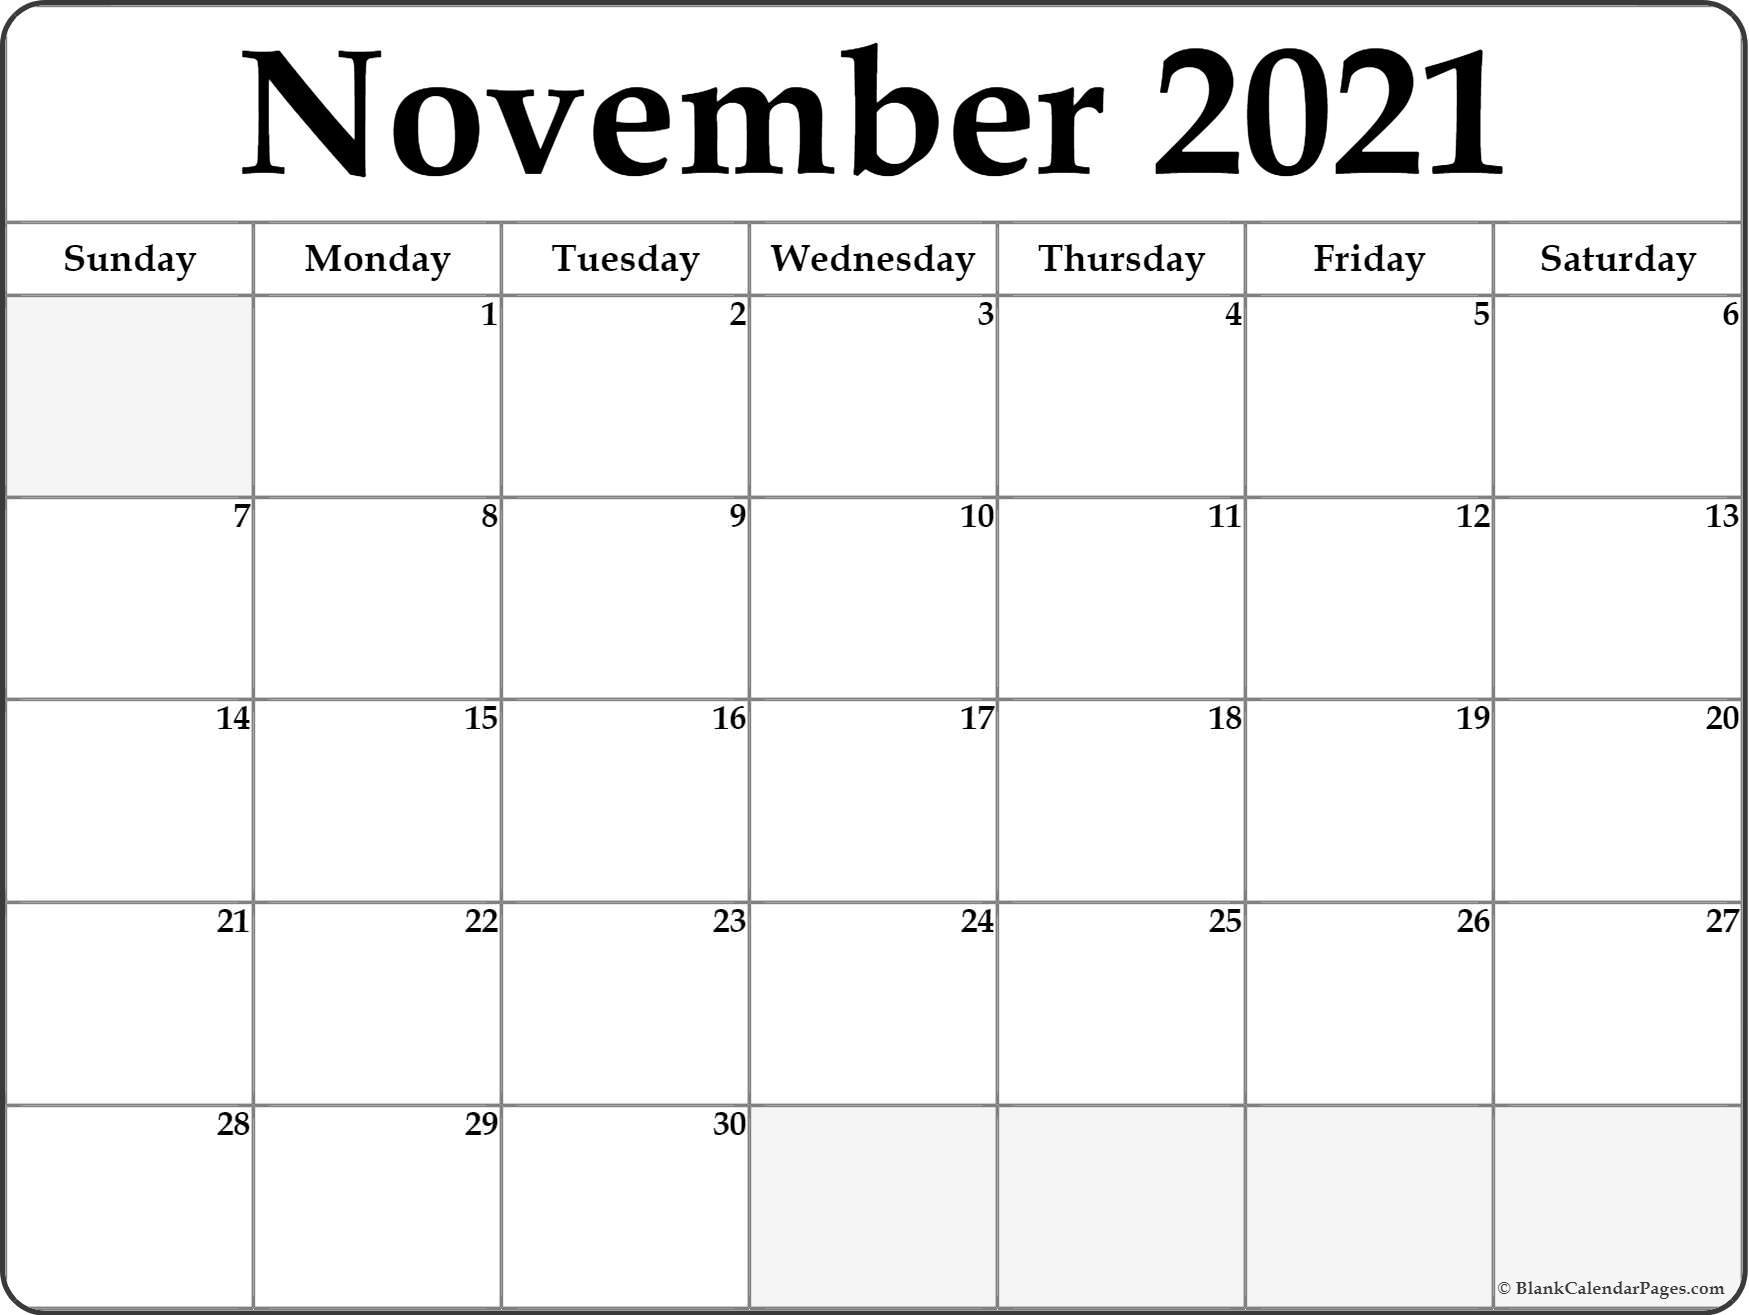 Blank November 2021 Calendar Free Printable   Printable Calendar Printable Calendar For November 2021